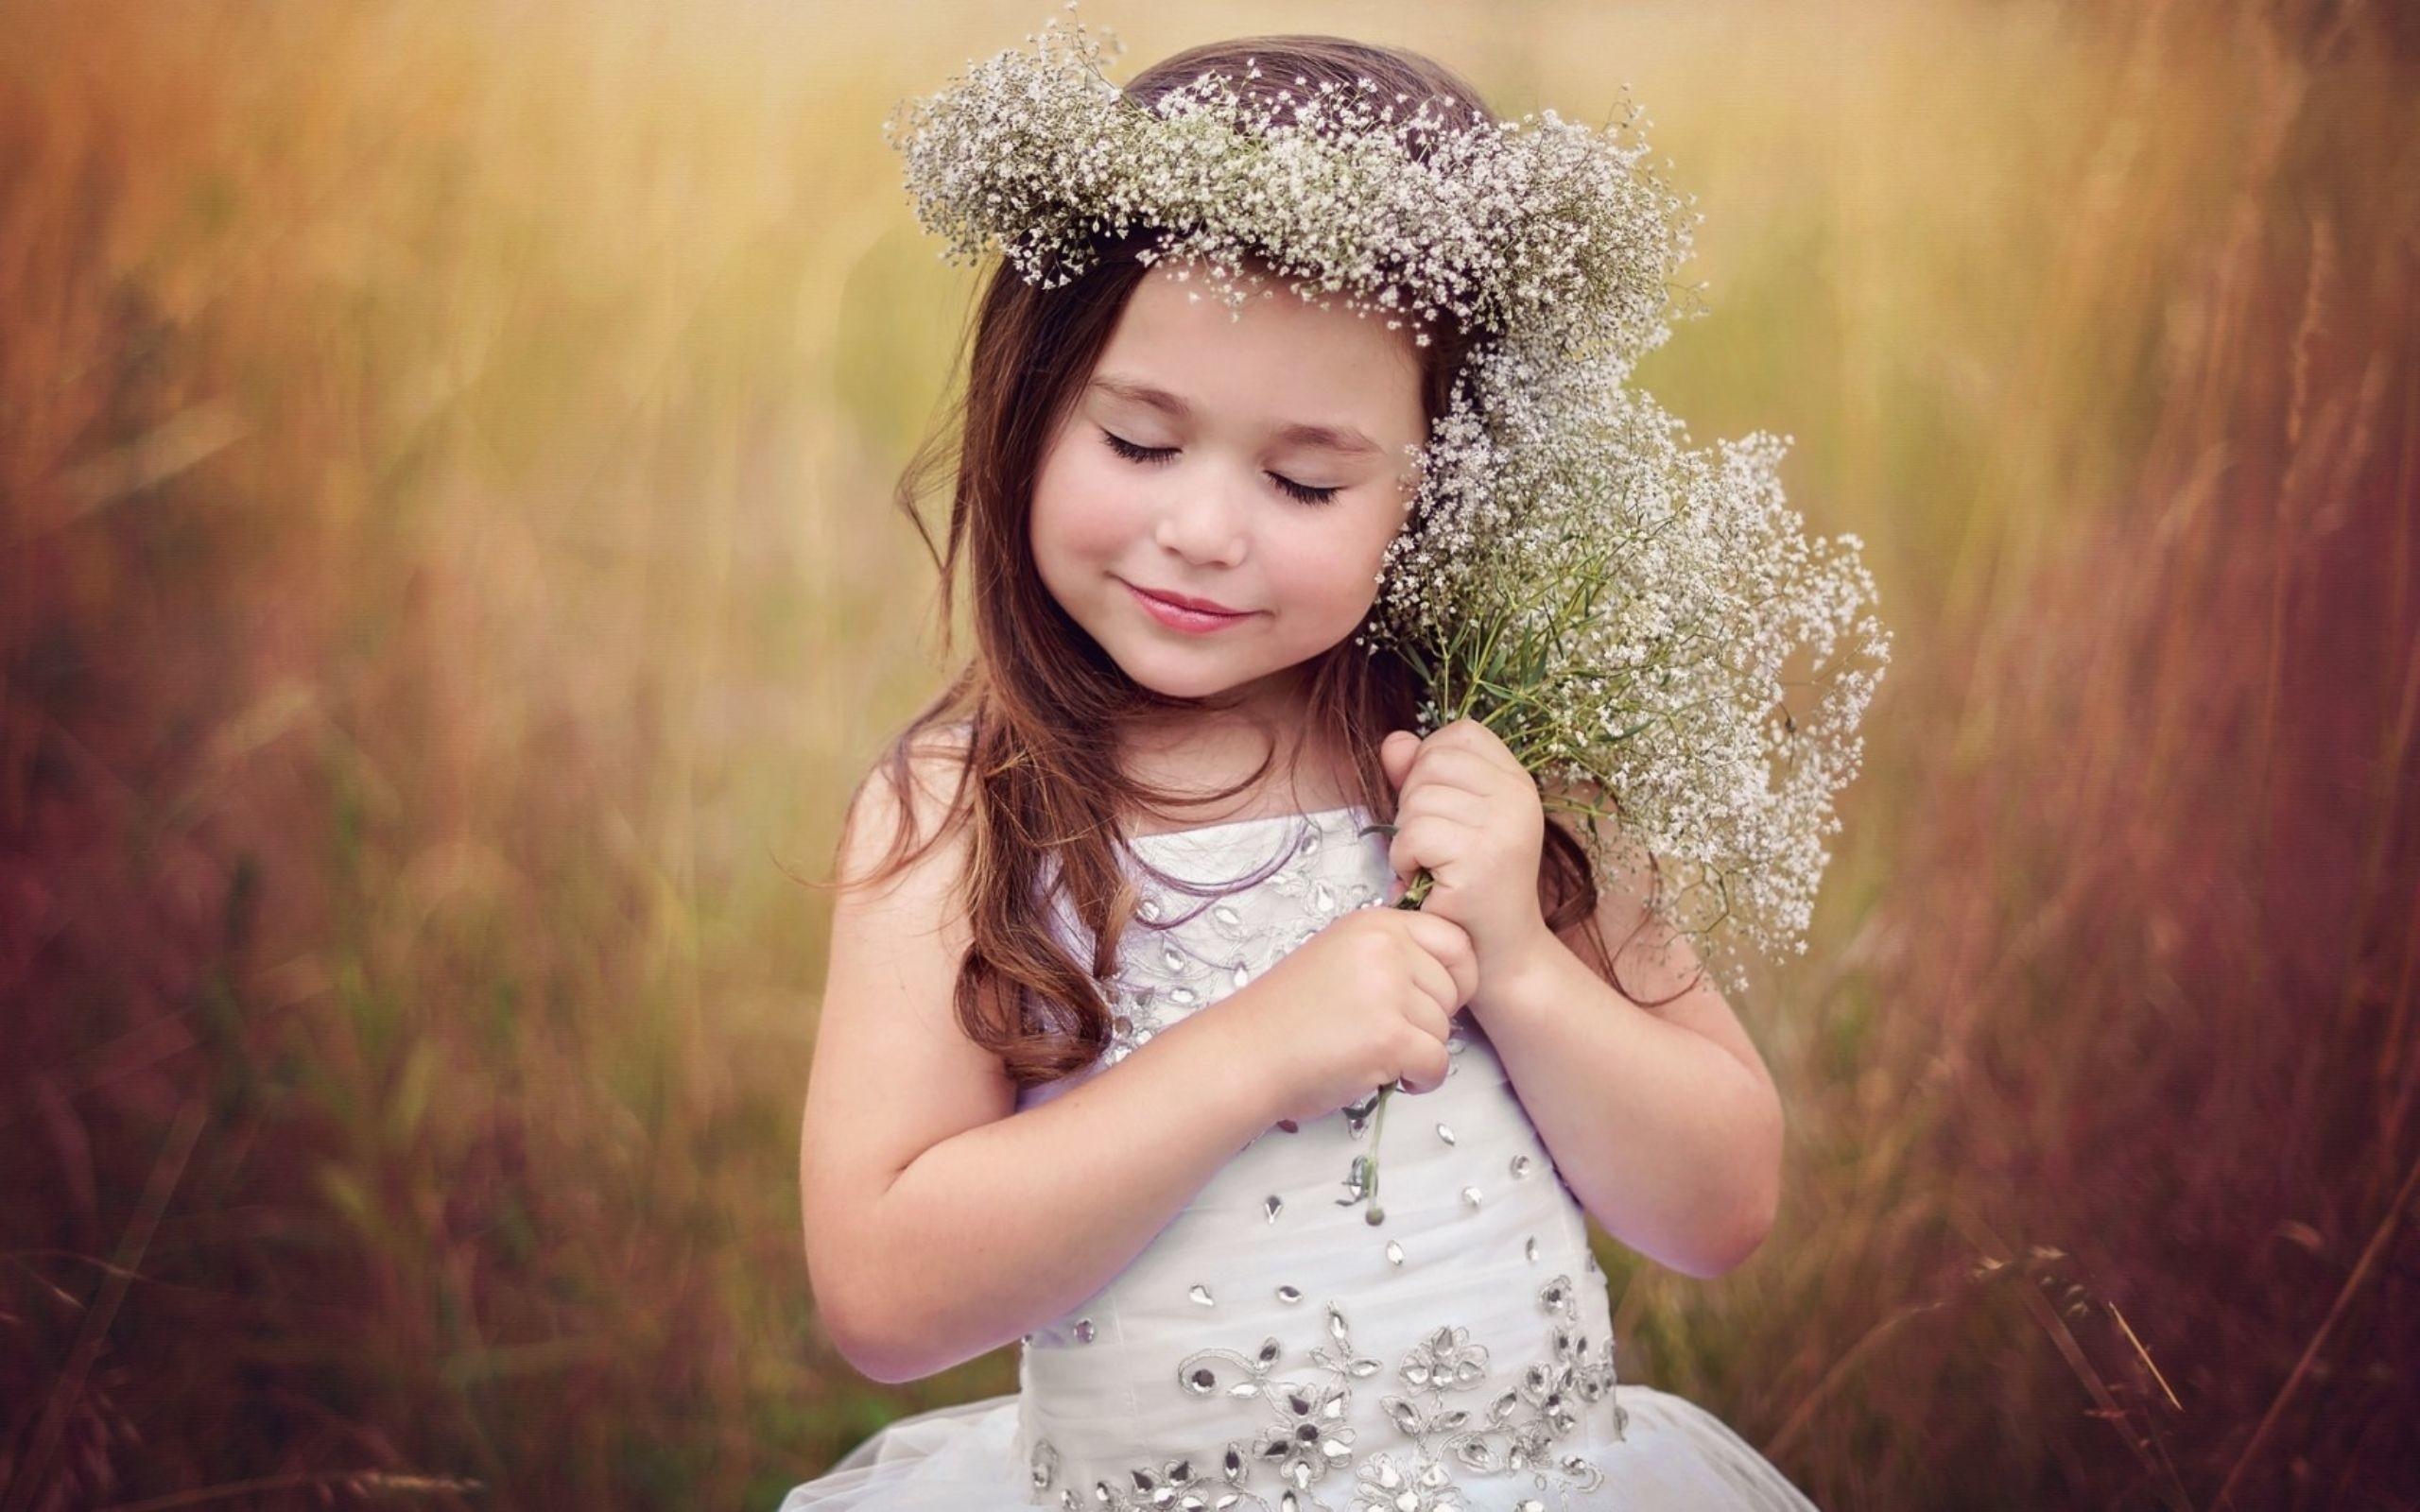 cute baby girl wallpaper